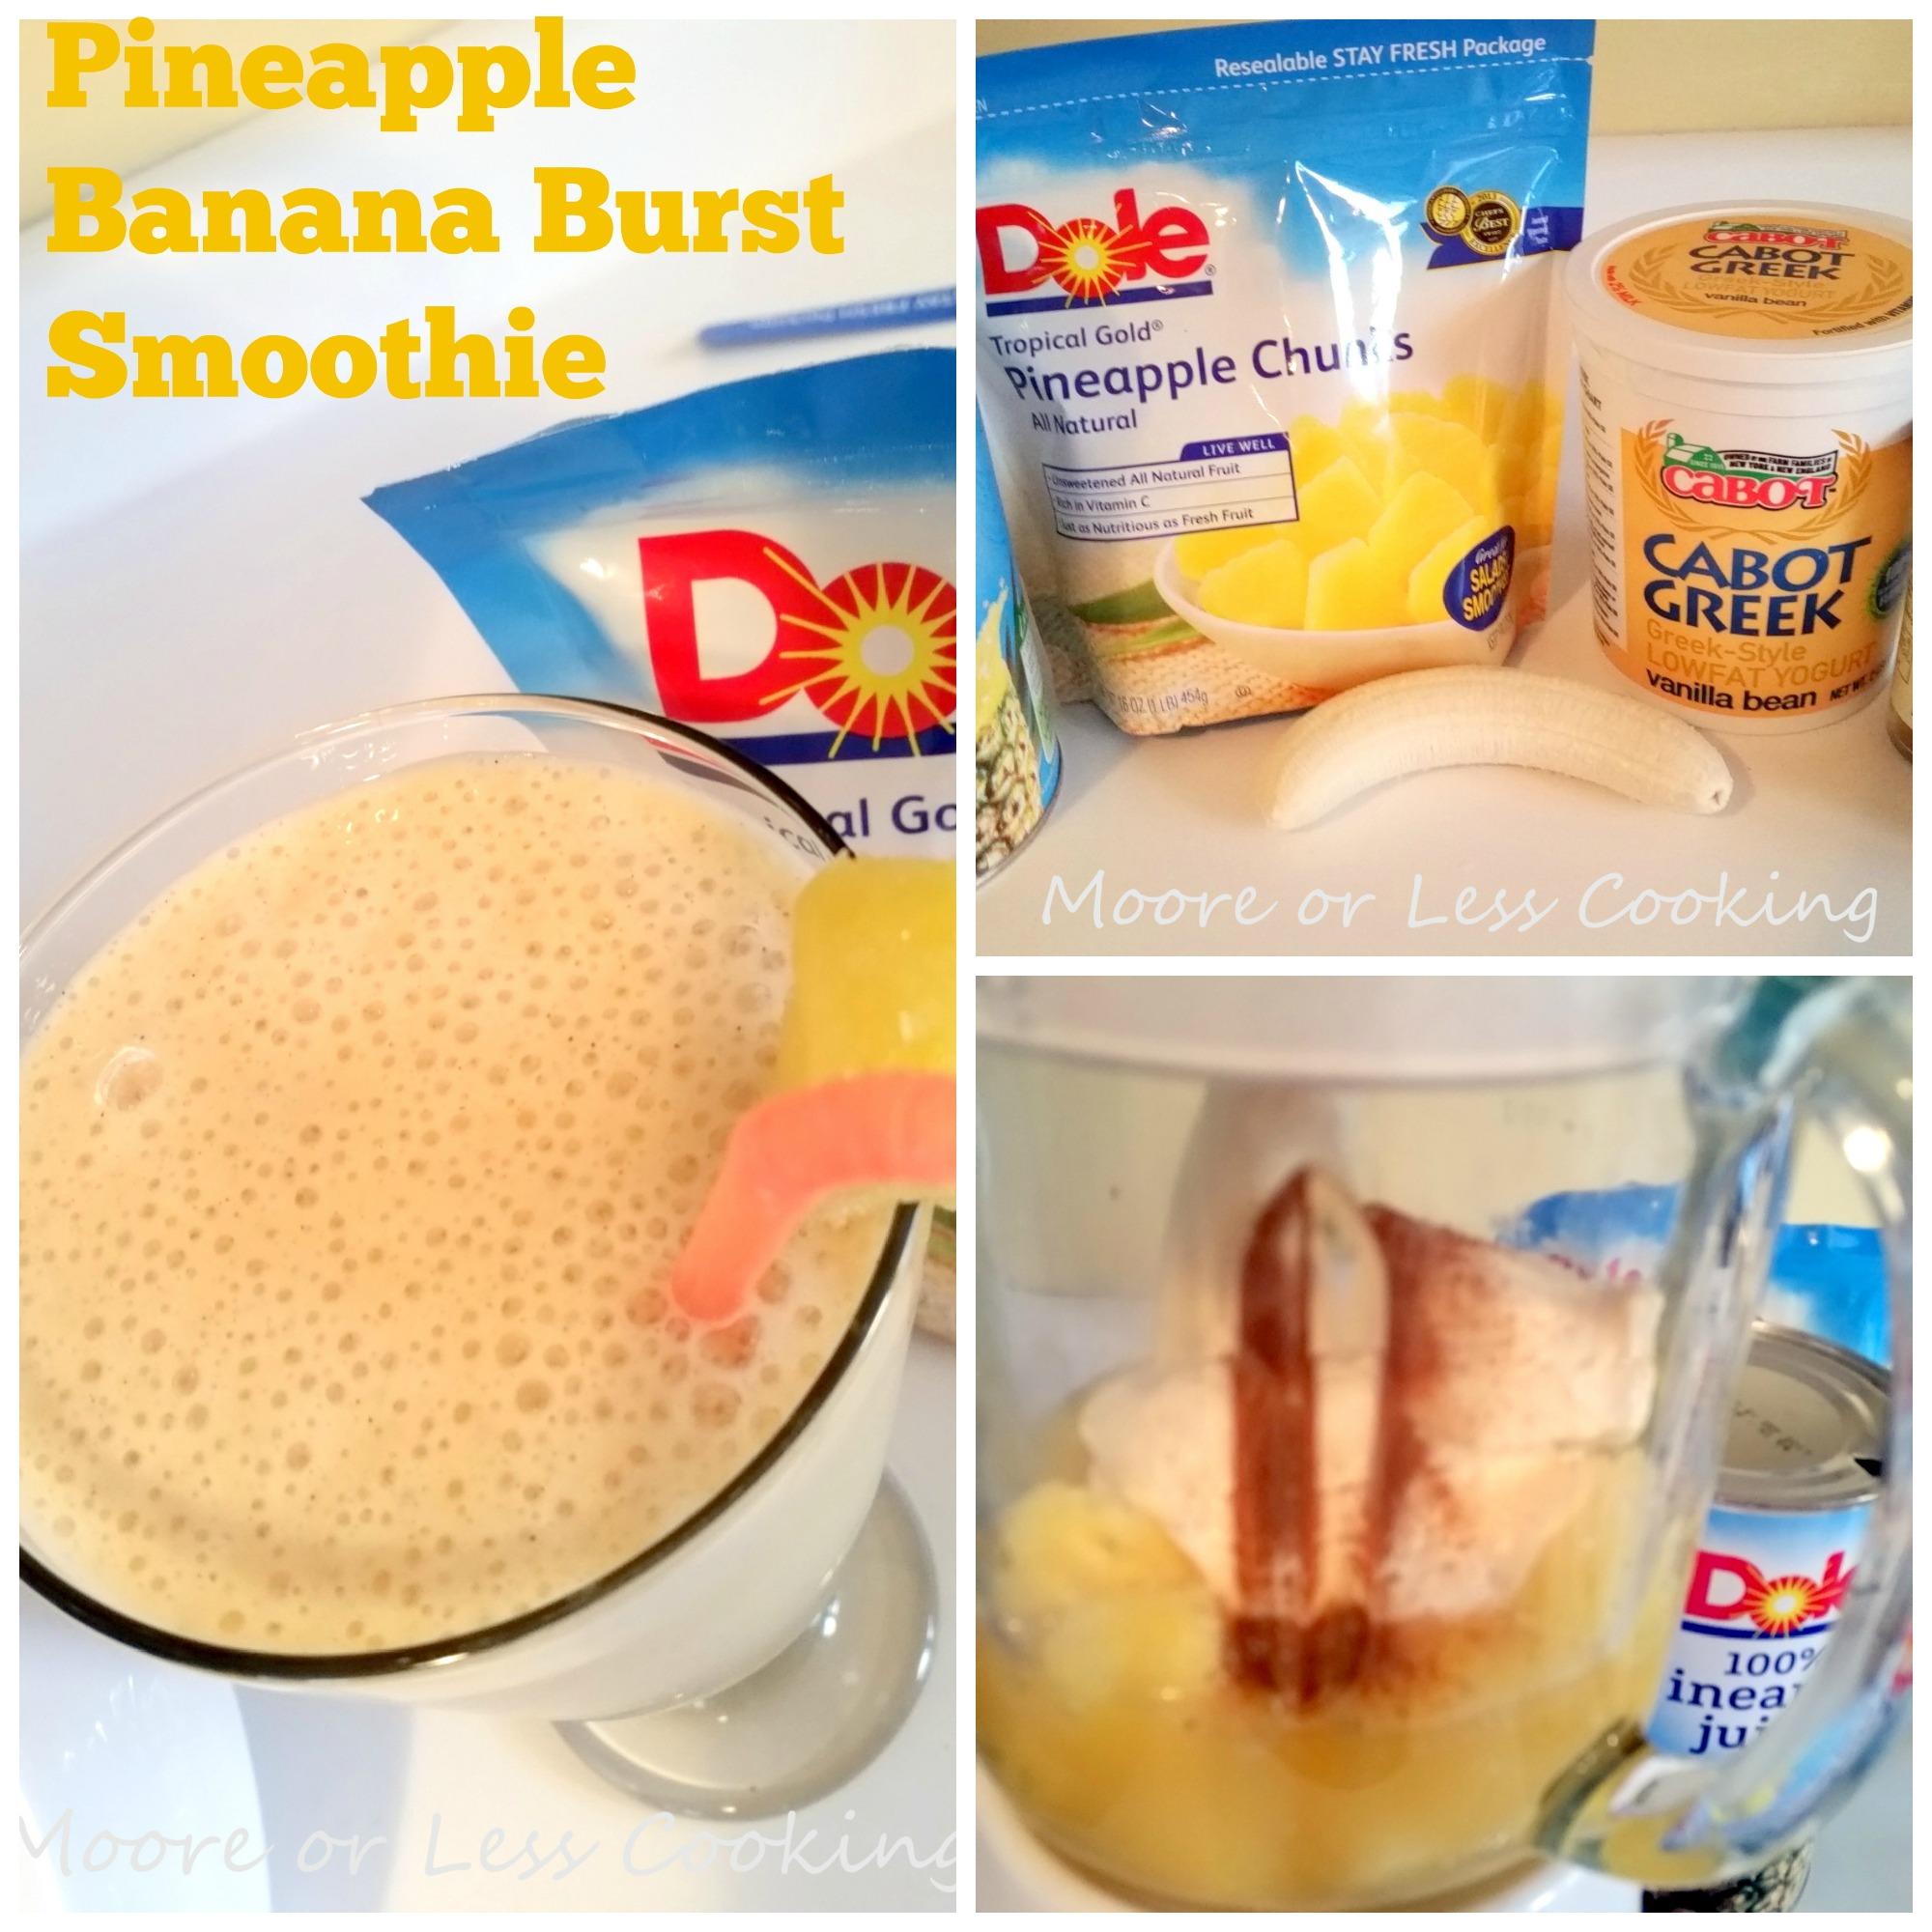 Pineapple Banana Burst Smoothie